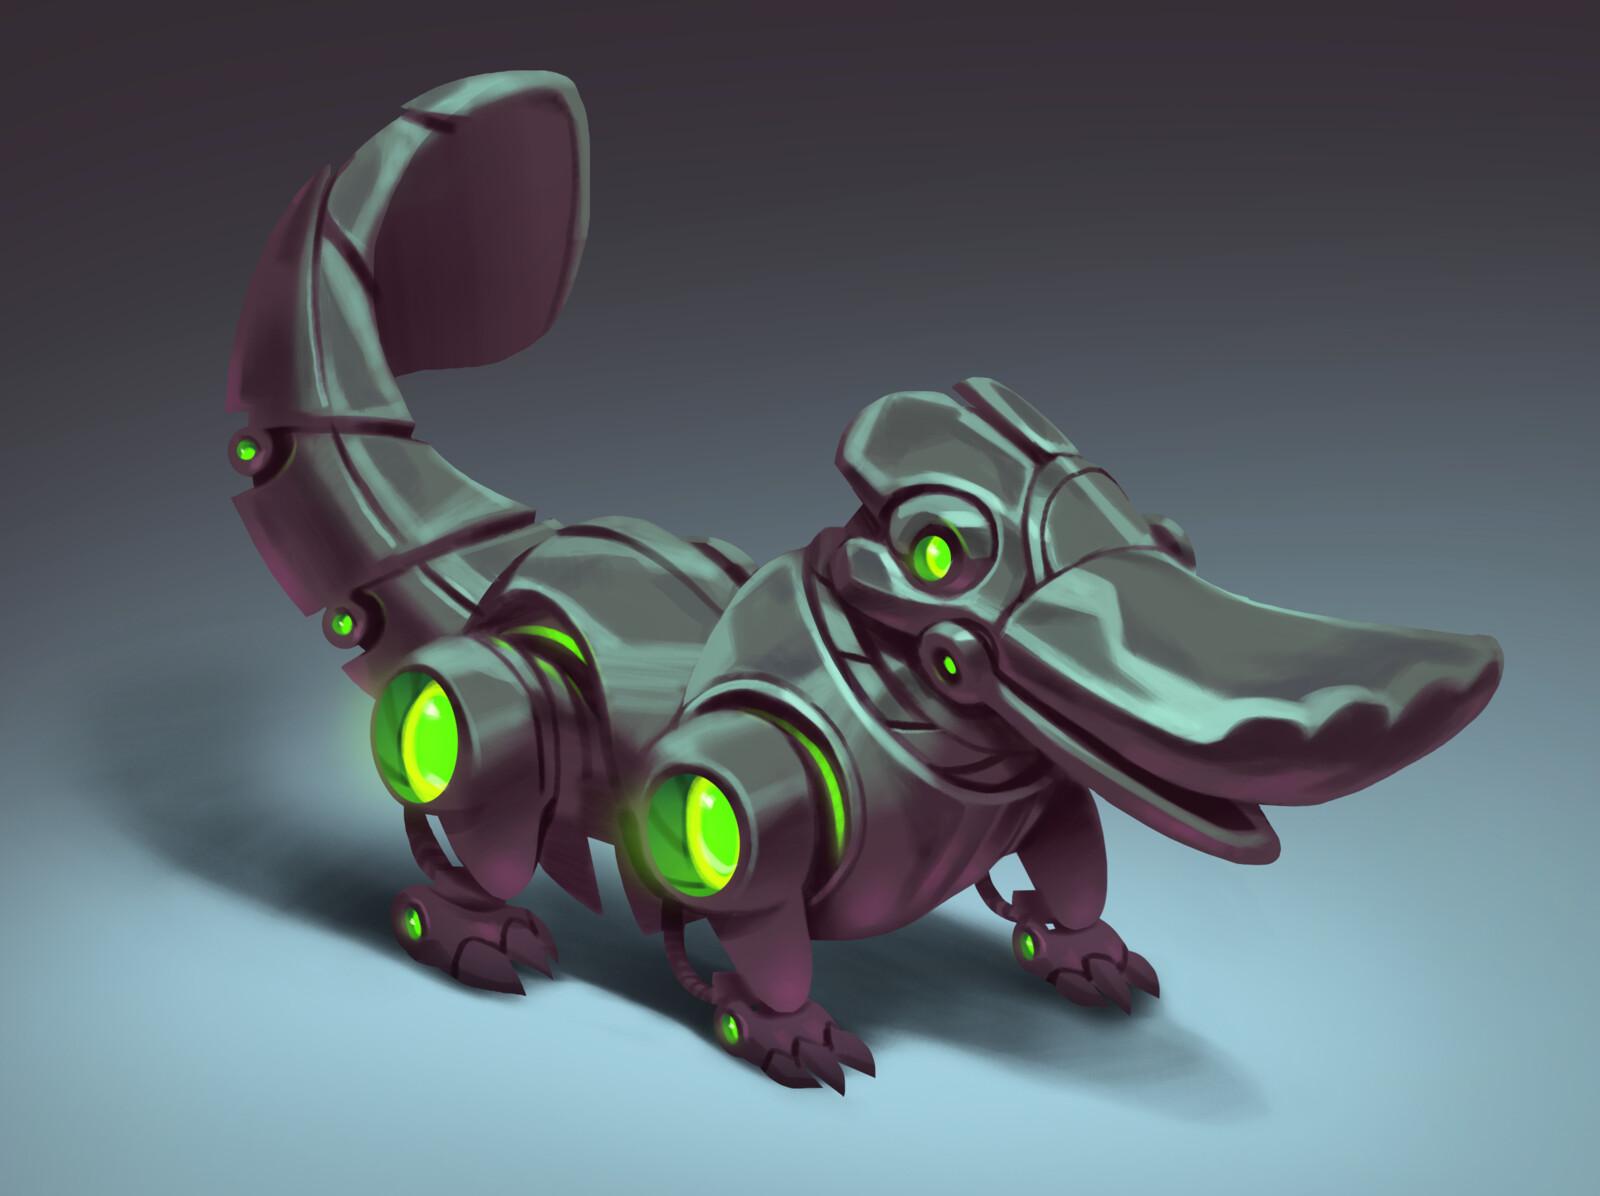 Mech Platypus - Sketch